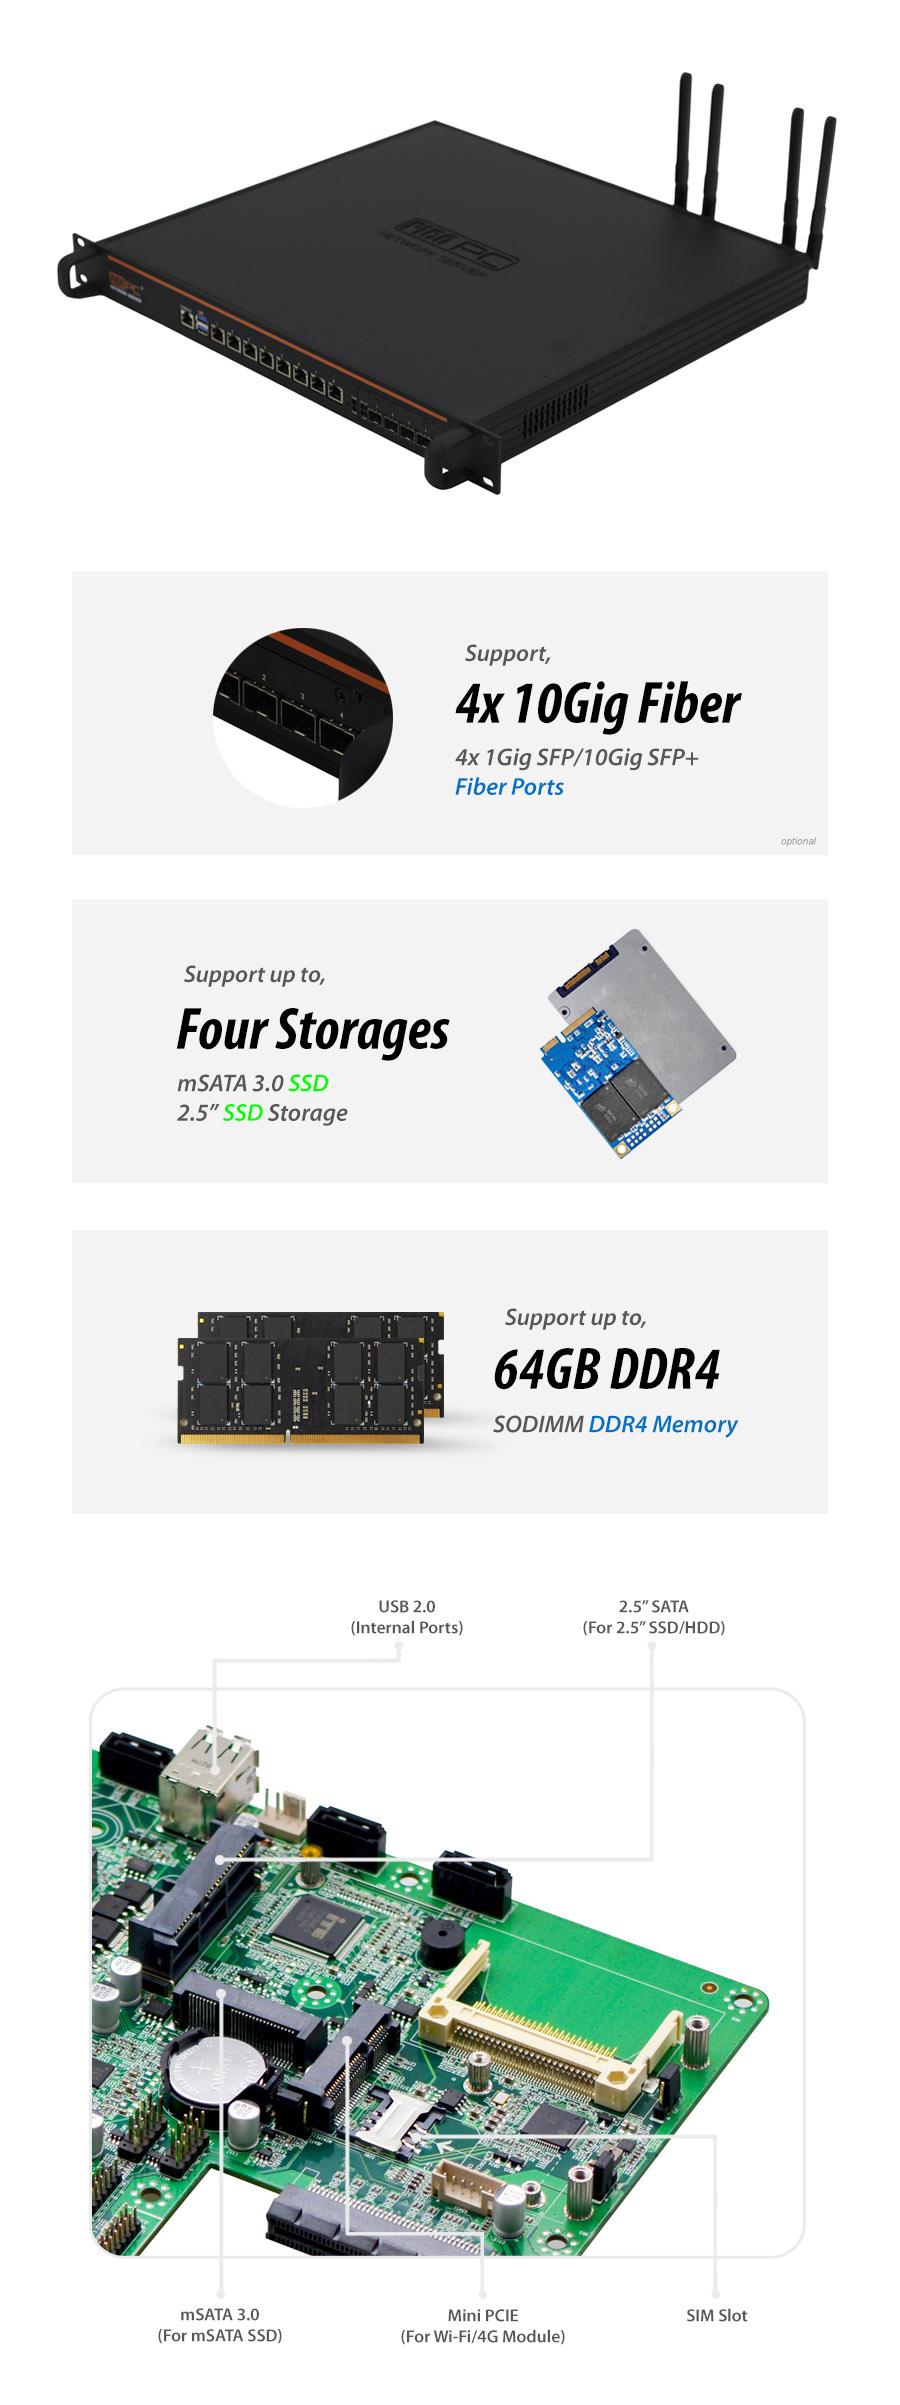 Intel® Core™ i7-9700 8 LAN 10Gig SFP+ 4G 1U Rackmount Server - NSHO-005 | Image